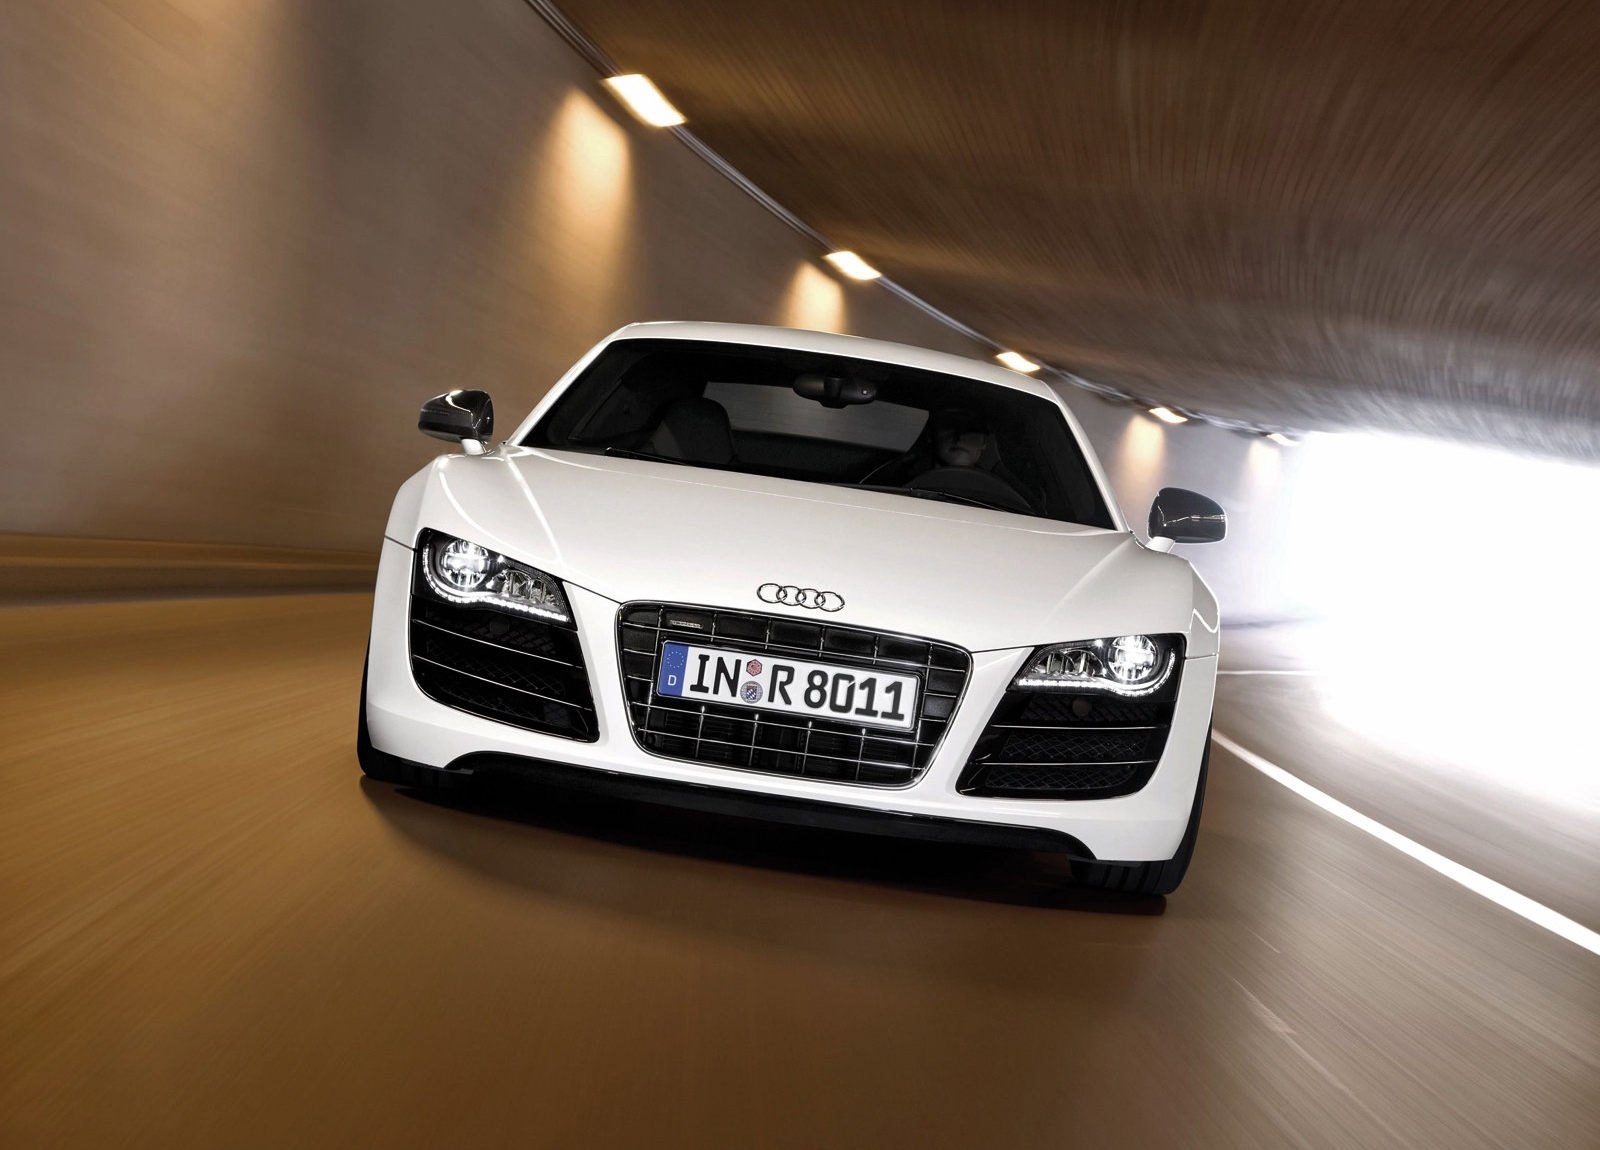 http://3.bp.blogspot.com/-4aVHLWQf_08/T28DG0MA_PI/AAAAAAAAFVI/Dcn1v0Aoyi4/s1600/Audi-2010_R8_V10_5.2_FSI_quattro_wallpaper-1600x1200_0038.jpg